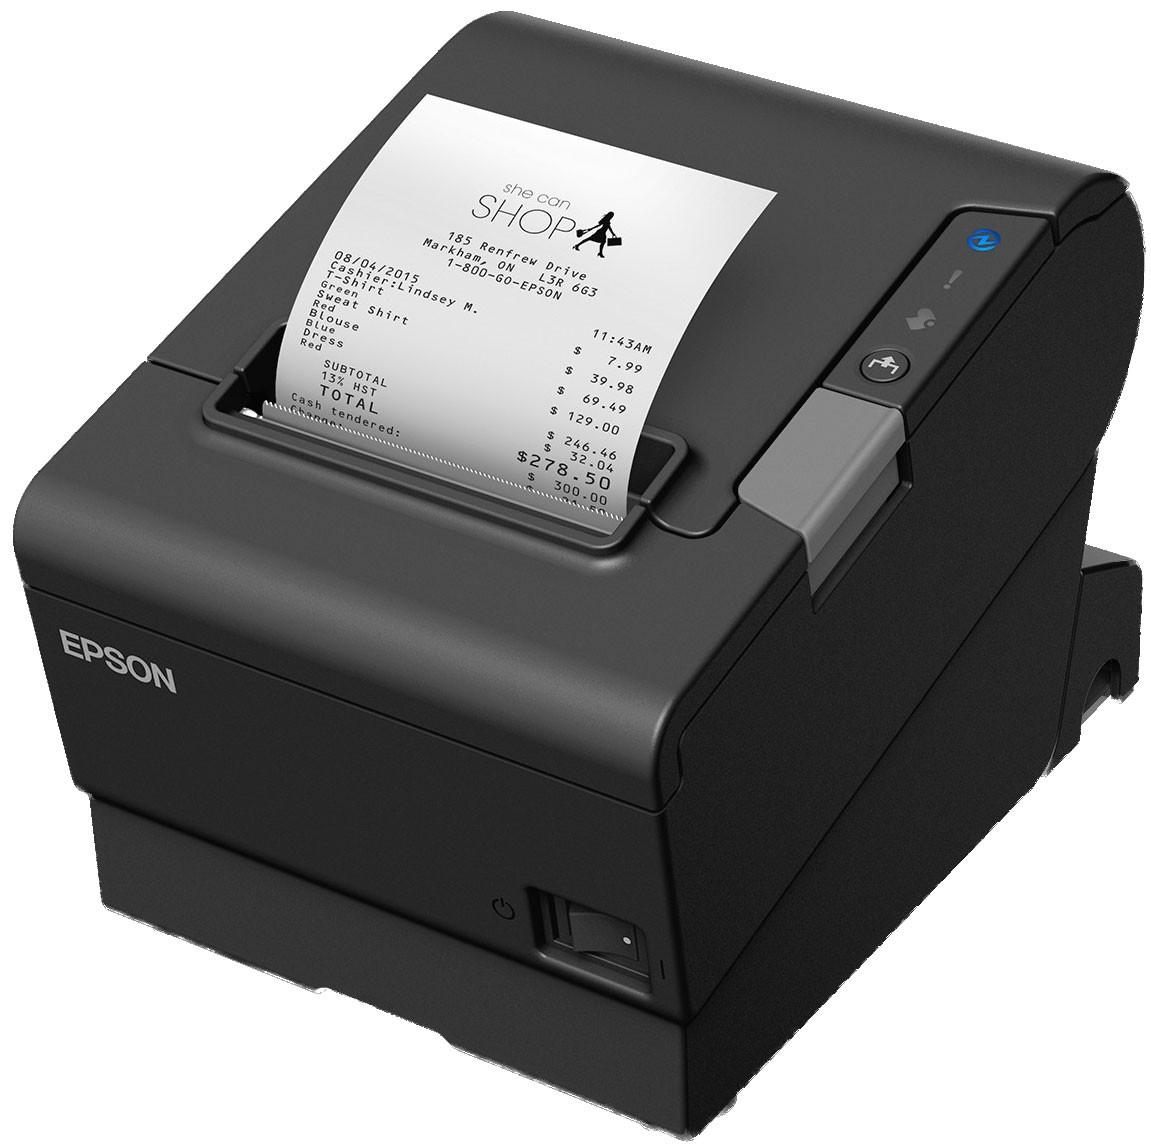 Epson TM-T88VI Wireless Printer; black (TM886WNG)